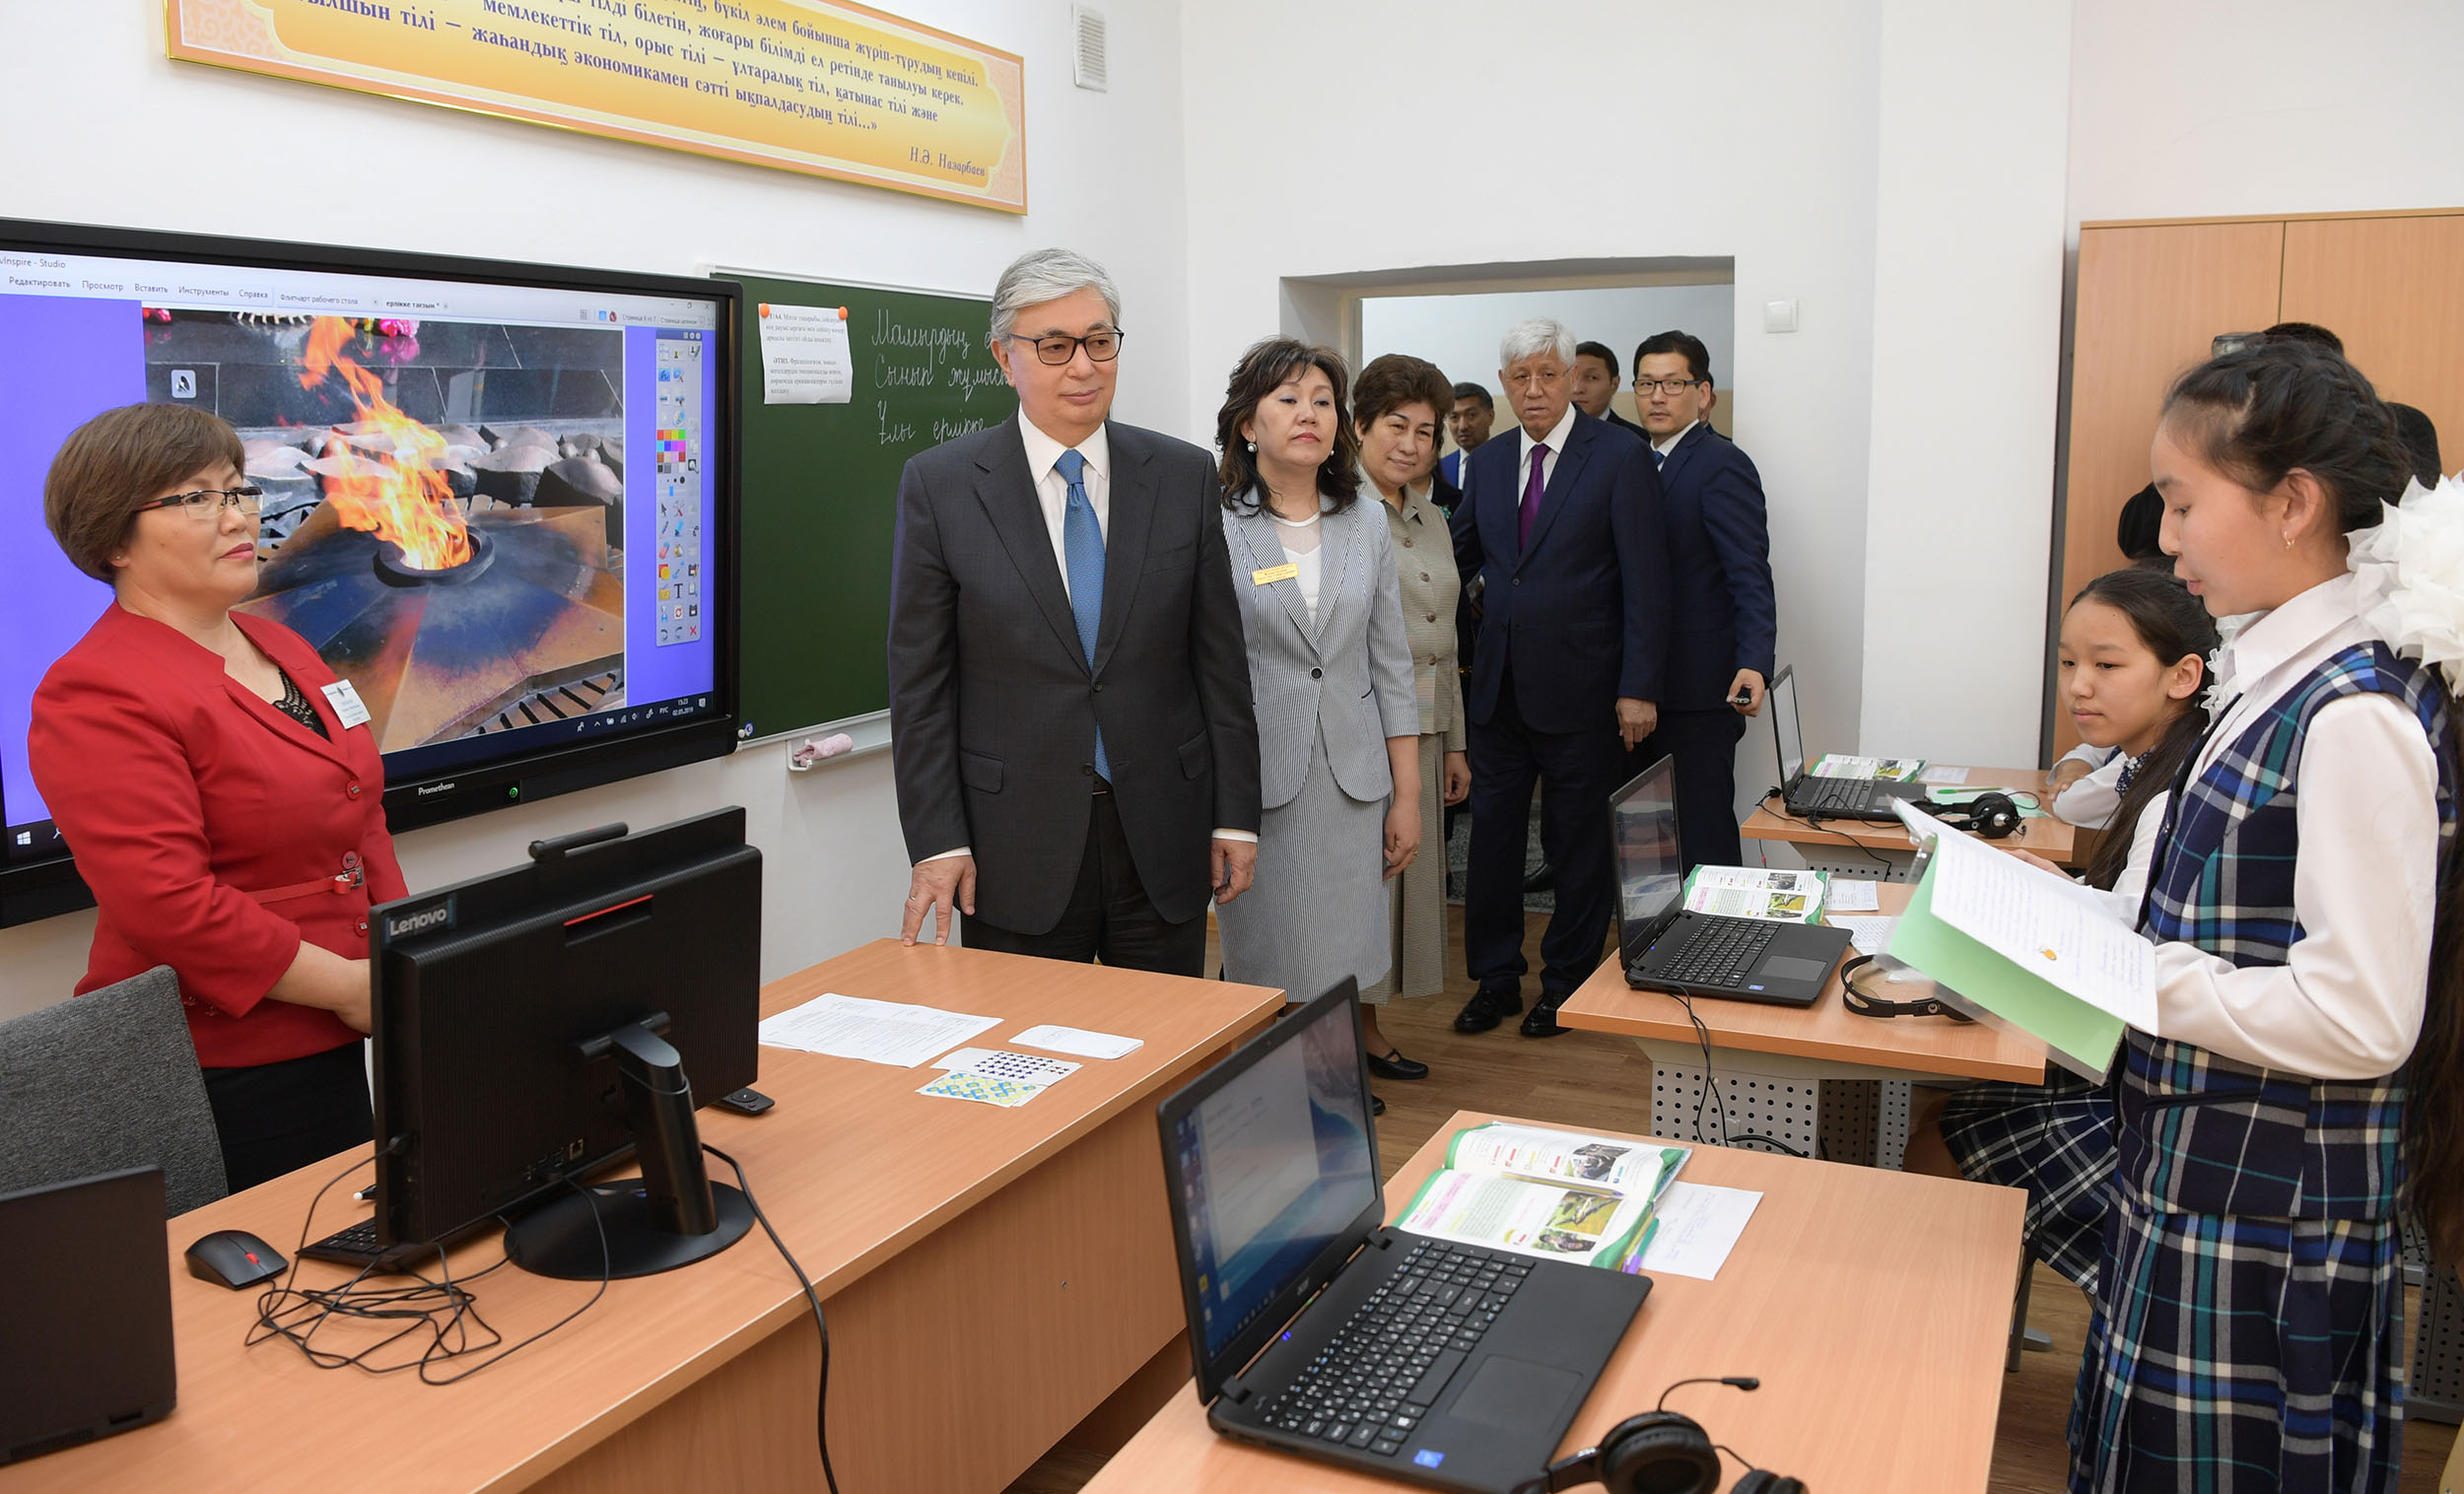 Президент Казахстана посетил школу в городе Уштобе